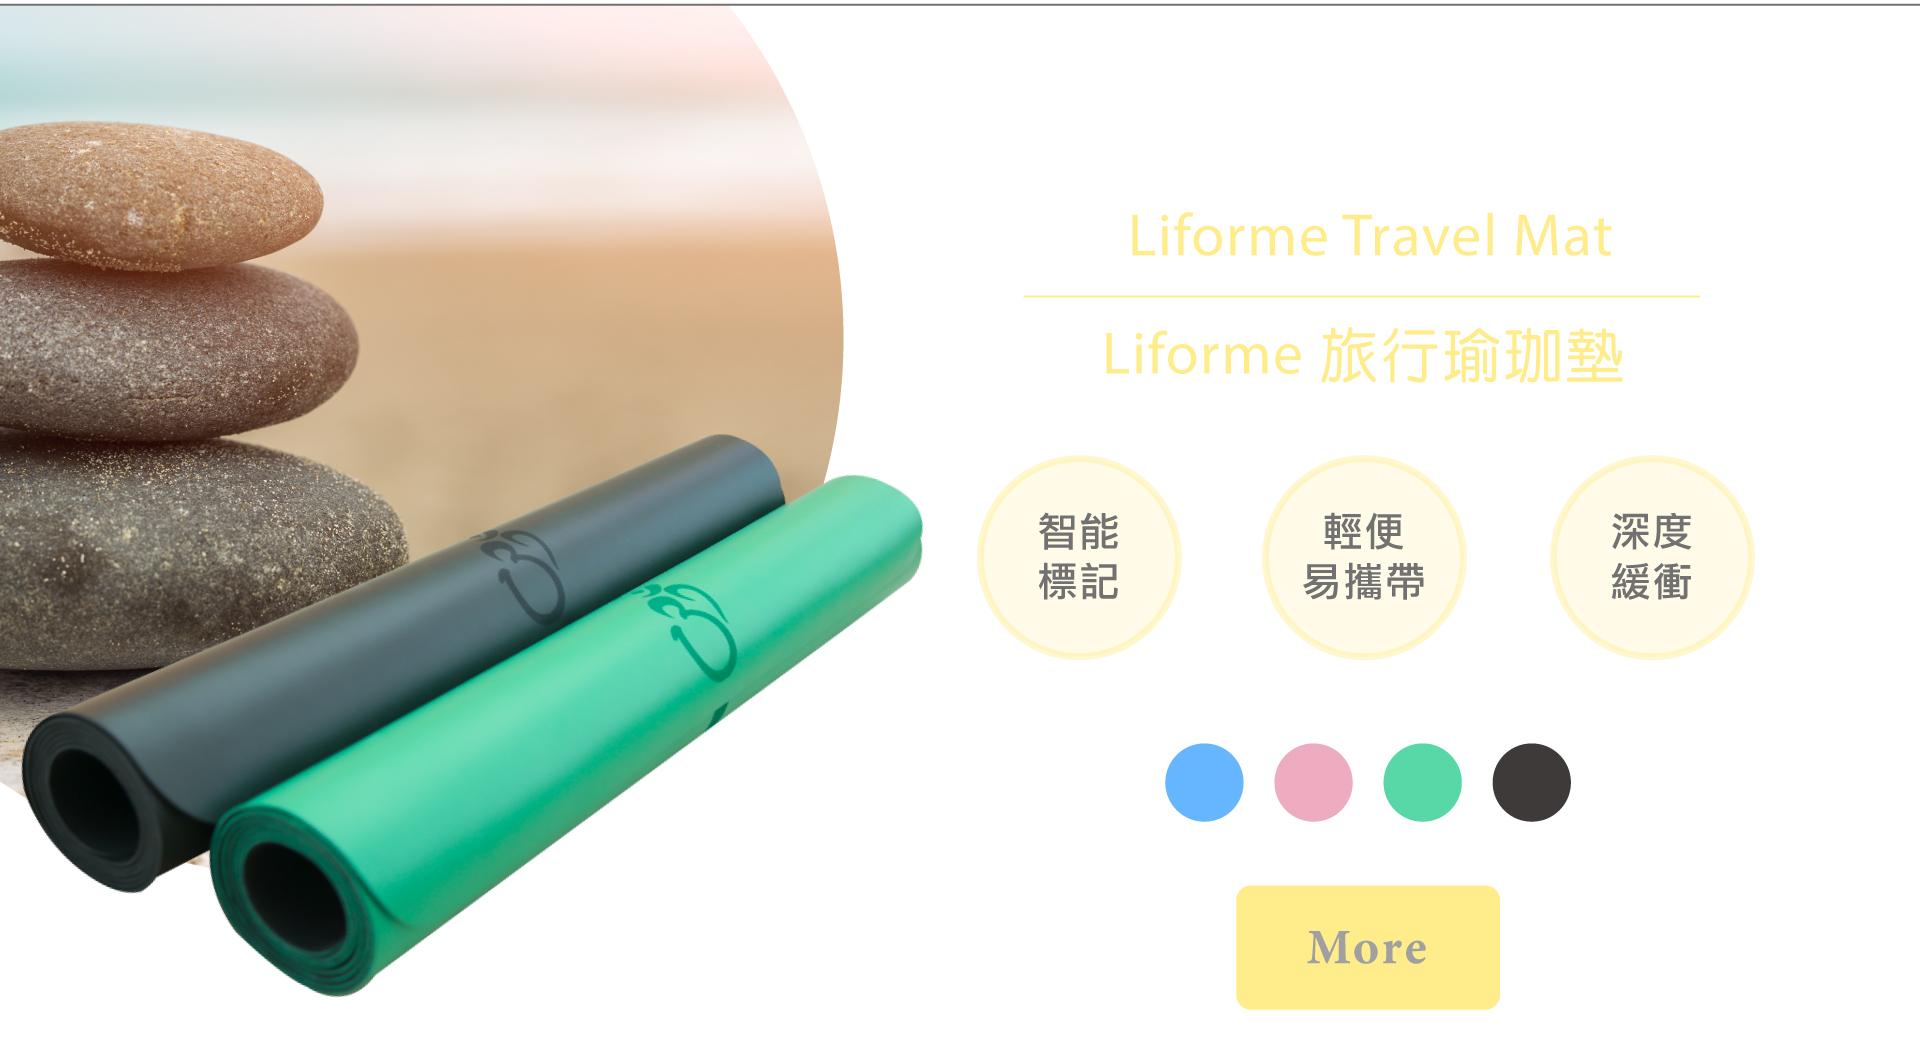 liforme travel mat